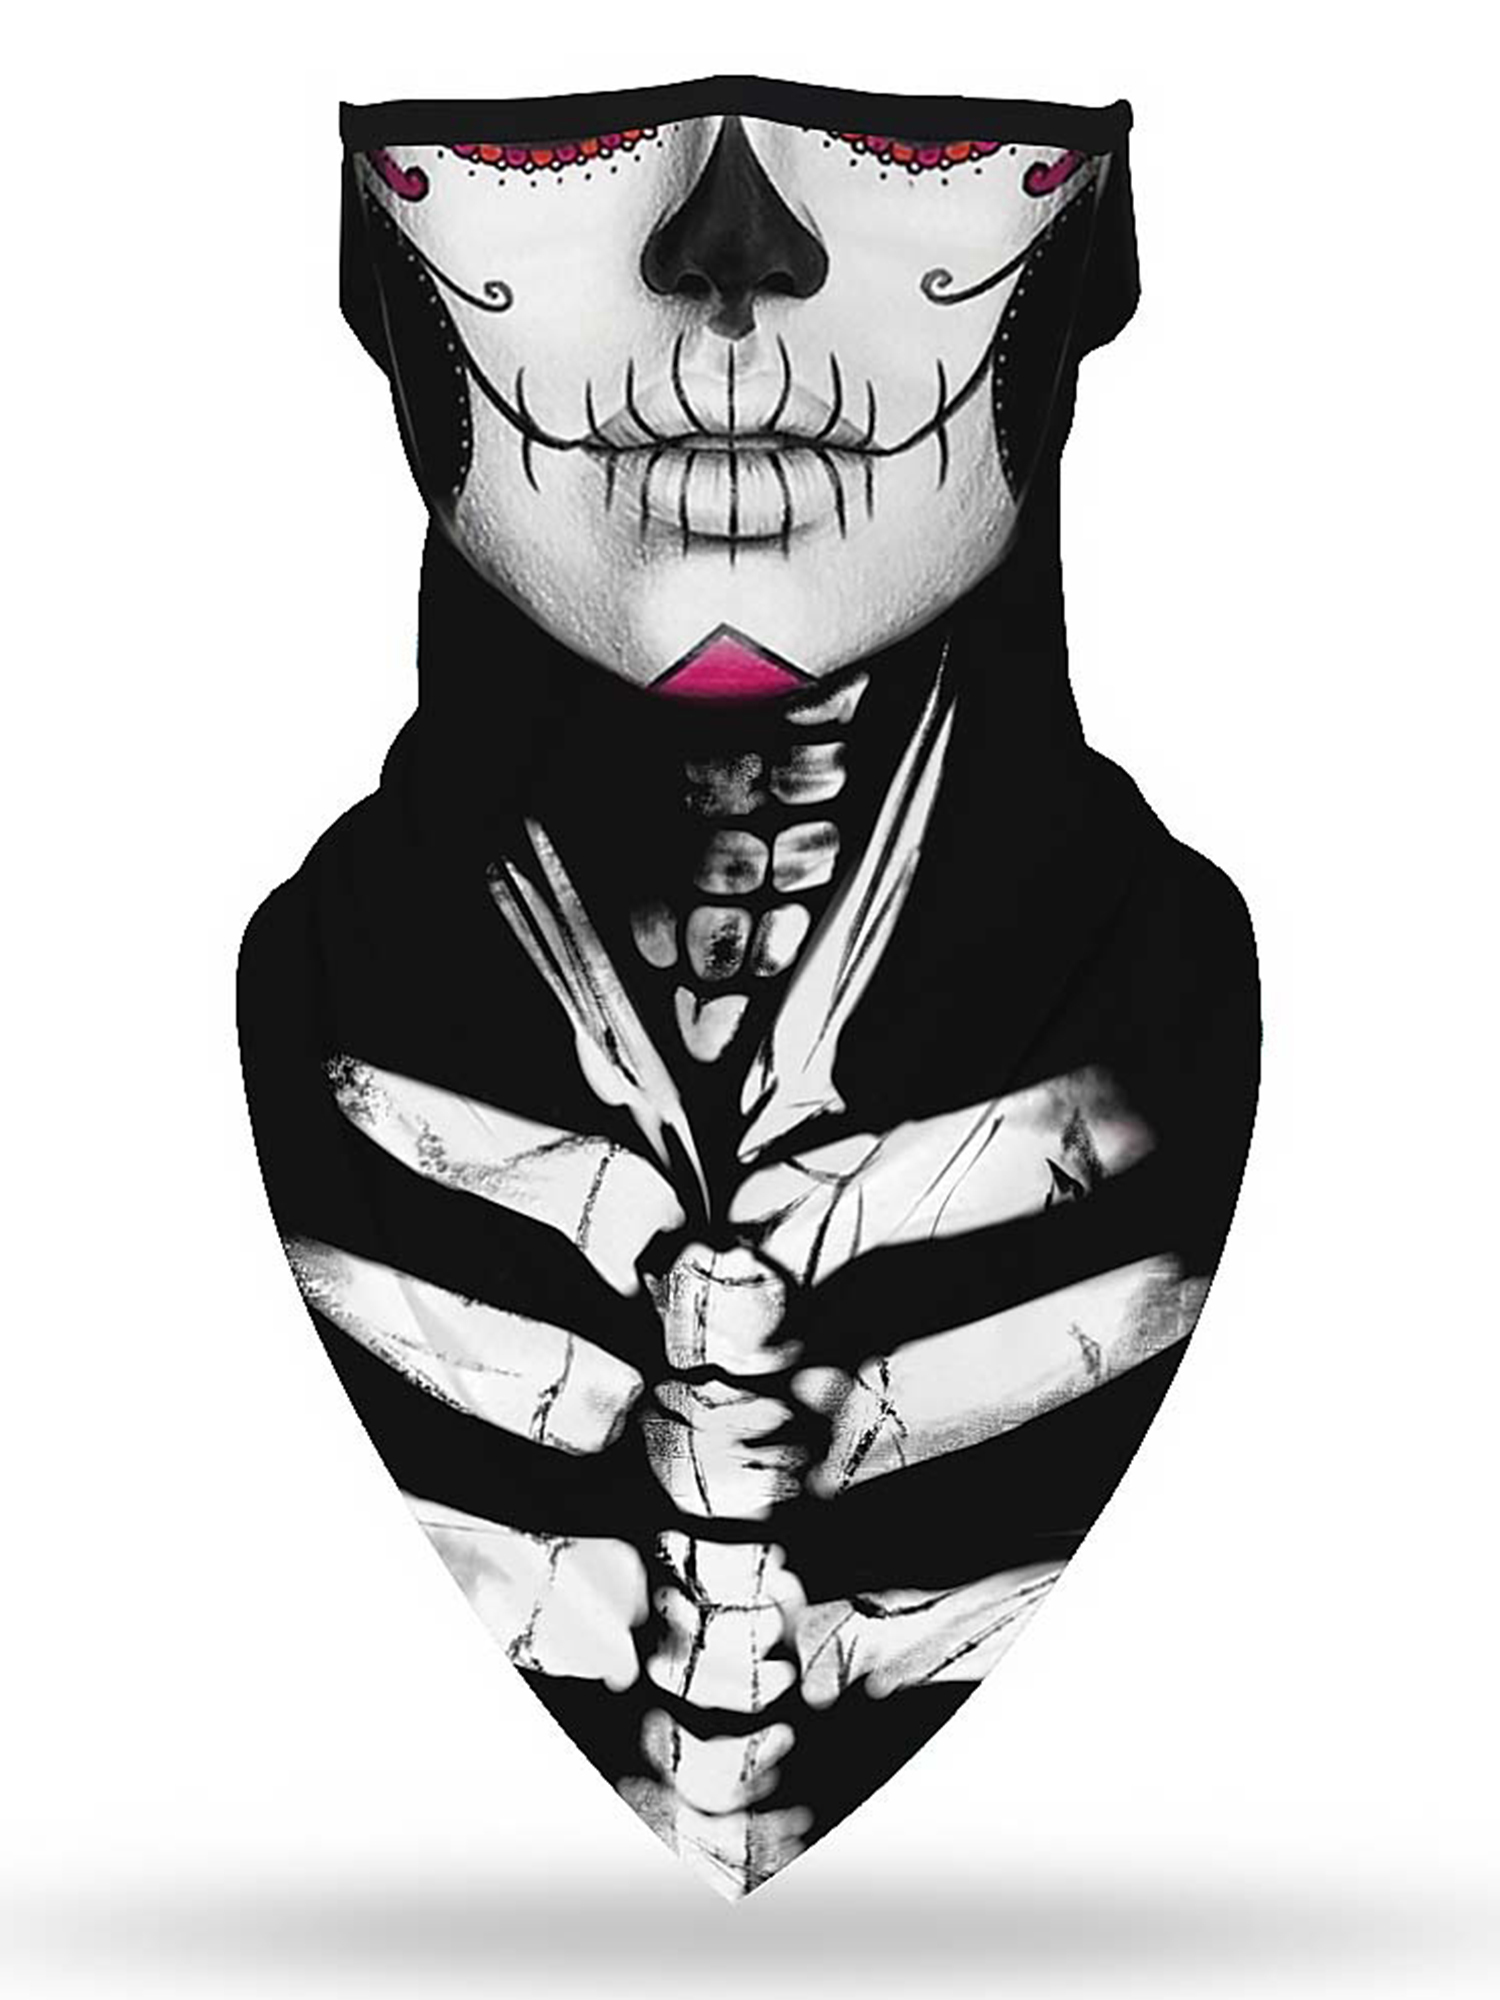 2 x Skull Skeleton Face Mask Neck Tube Scarf Ski Biker Snood Balaclava Bandana